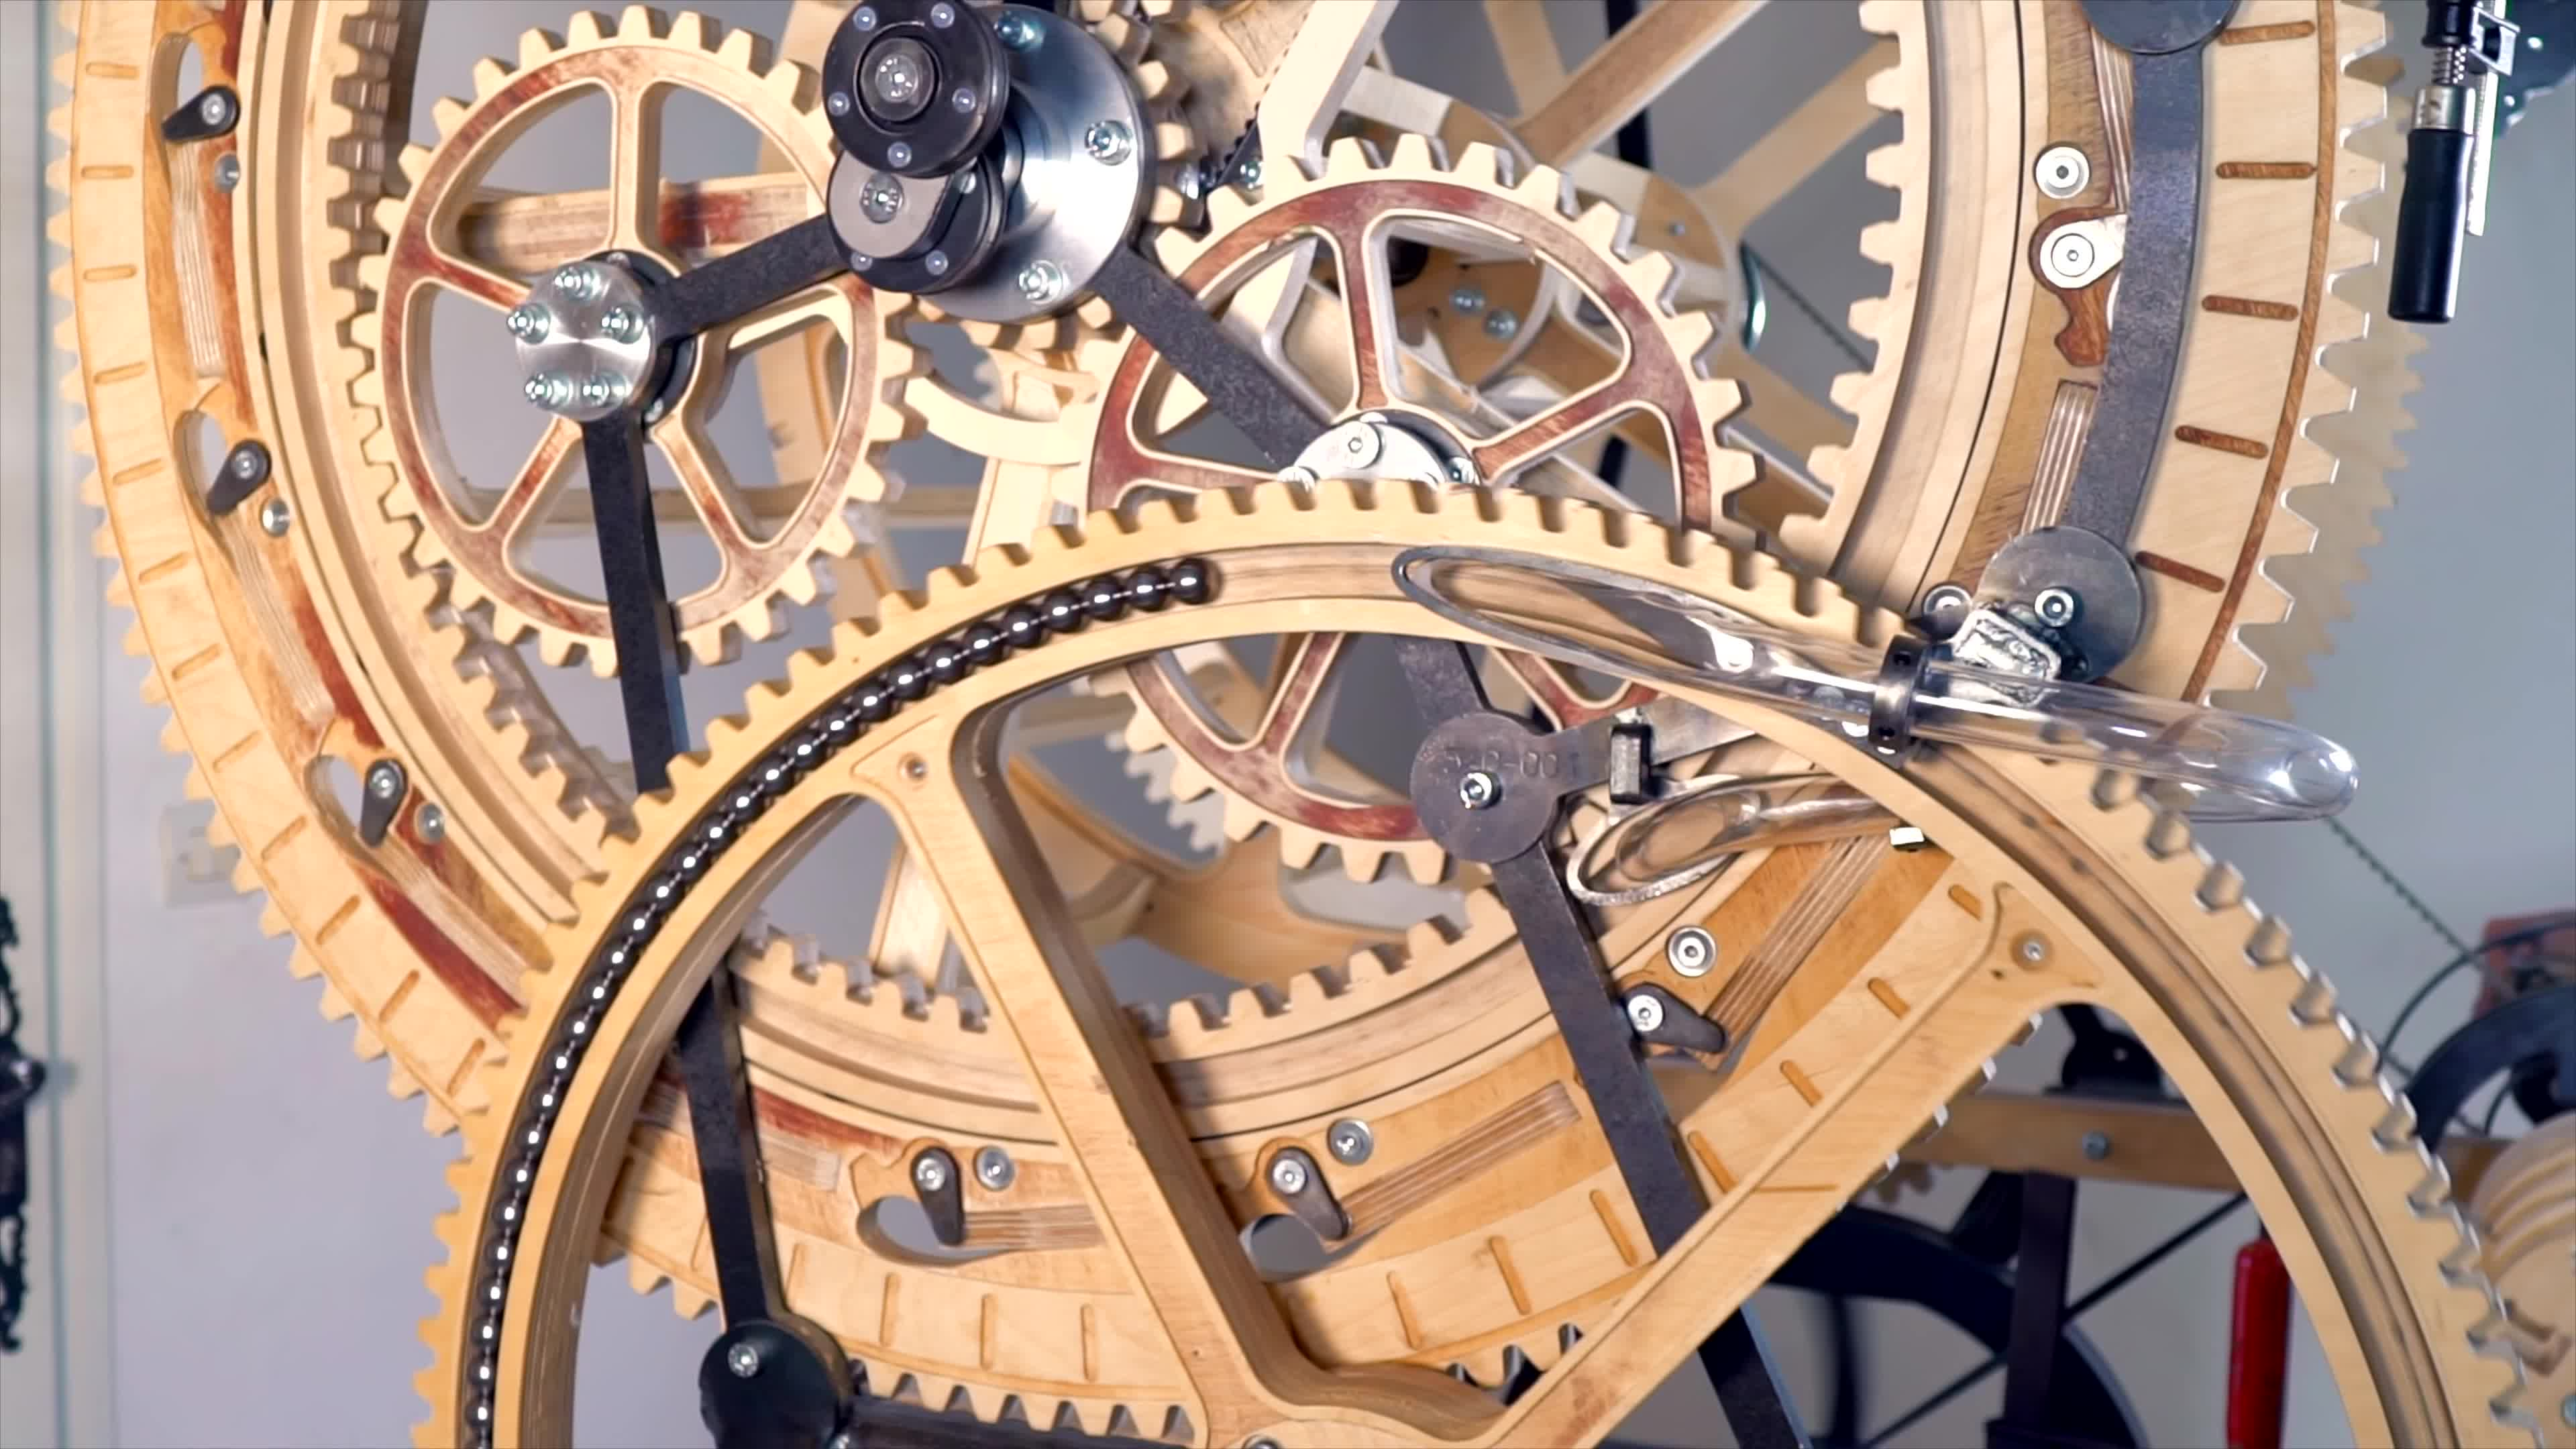 Marble Machine, Martin molin, diy, fusion 360, making, marble machine x, marble run, music instrument, wintergatan, woodworking, Magnet Polarity Switch - Marble Machine X #60 GIFs